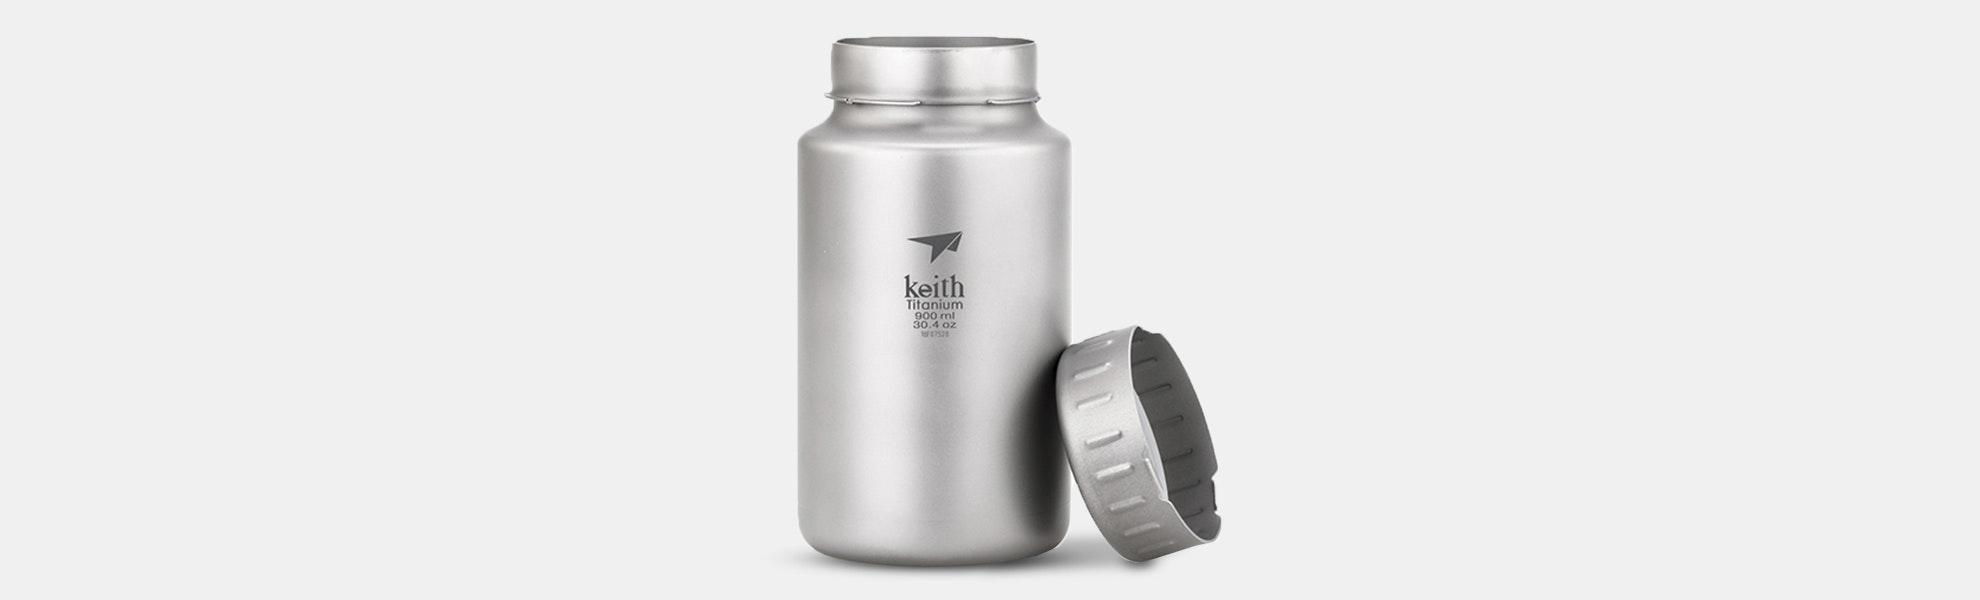 Keith Titanium 900ml / 1200ml Sport Bottles